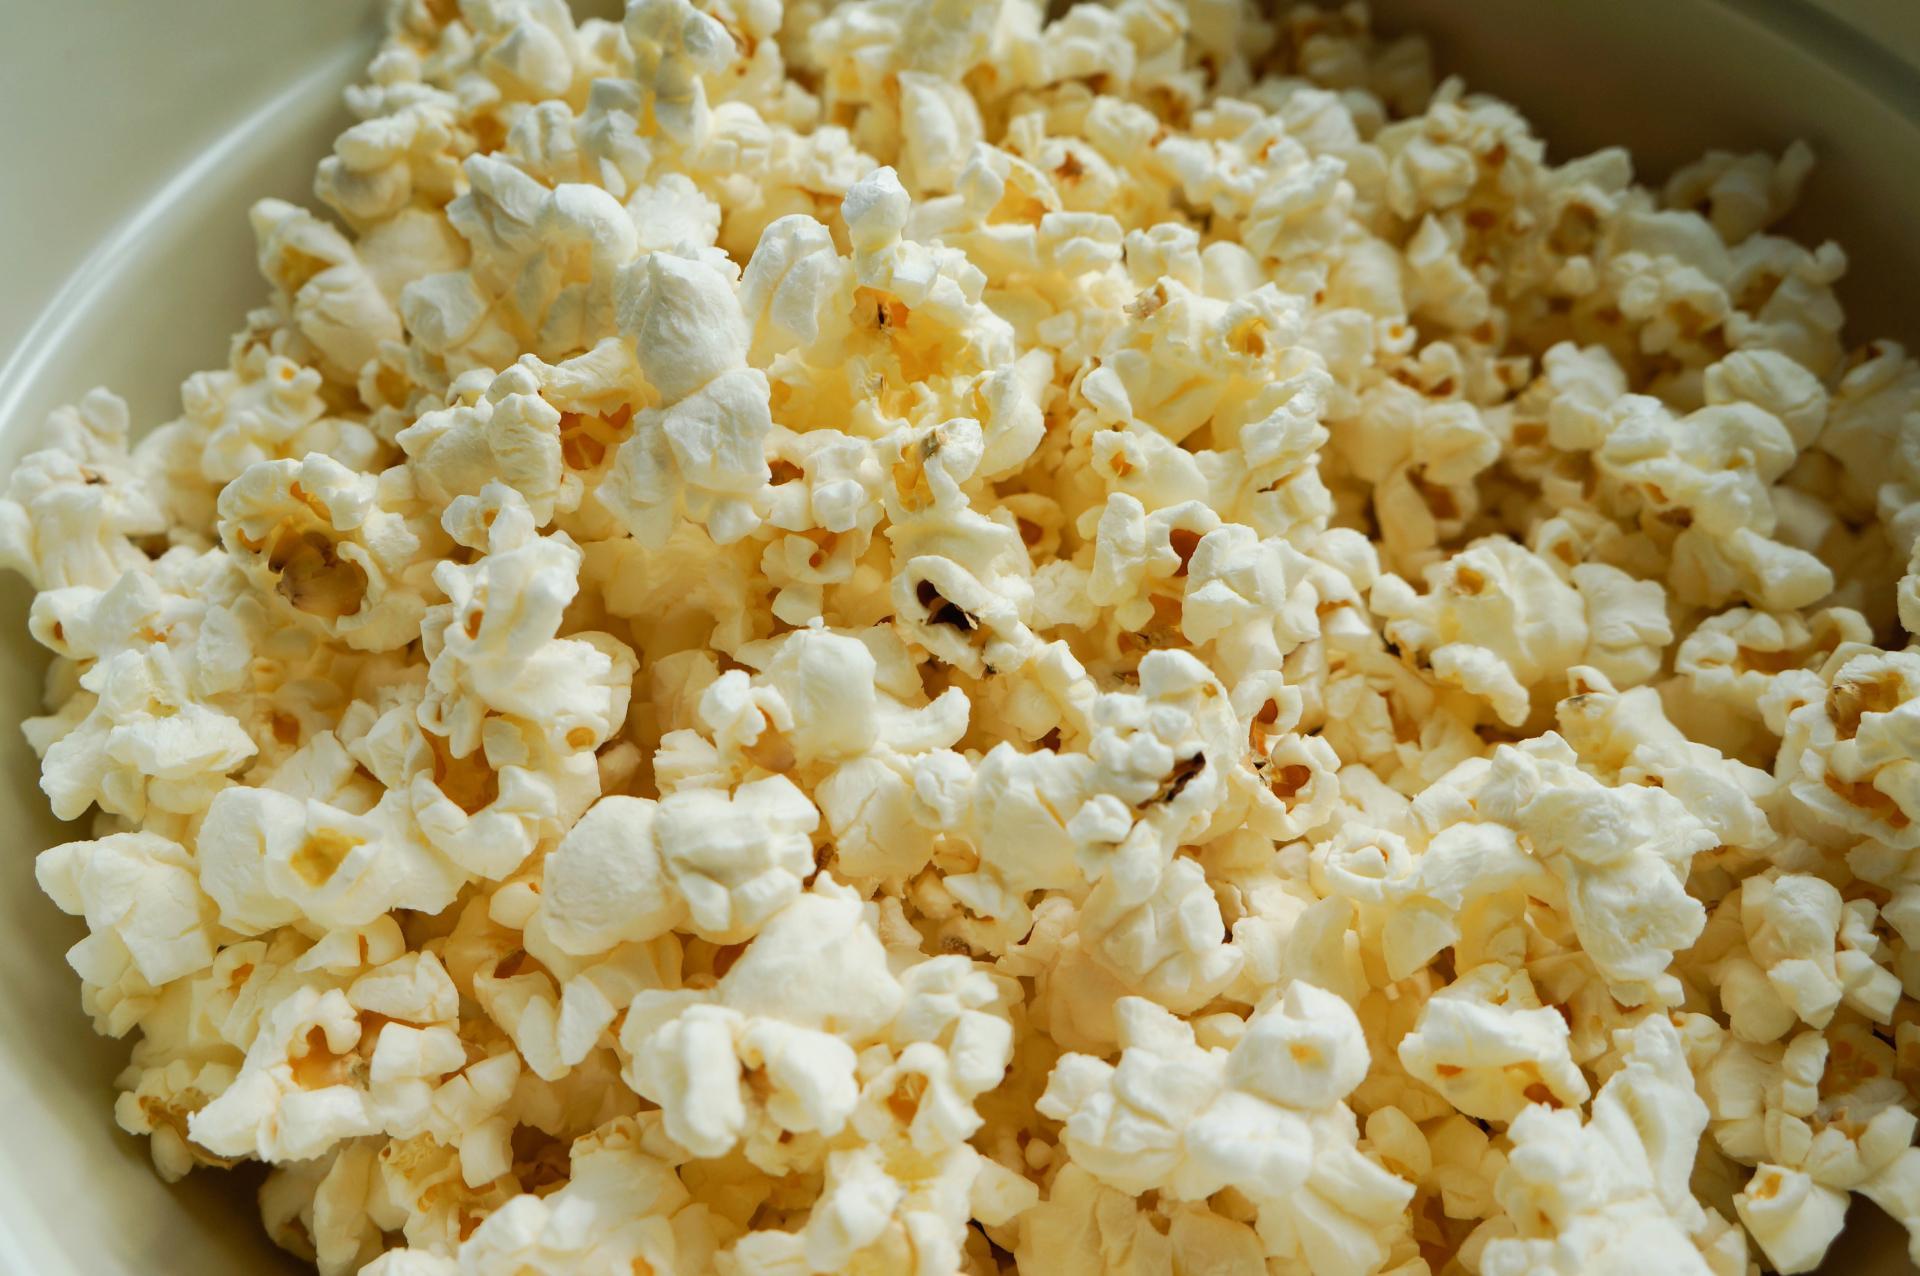 Popcorn Wallpaper HD Download